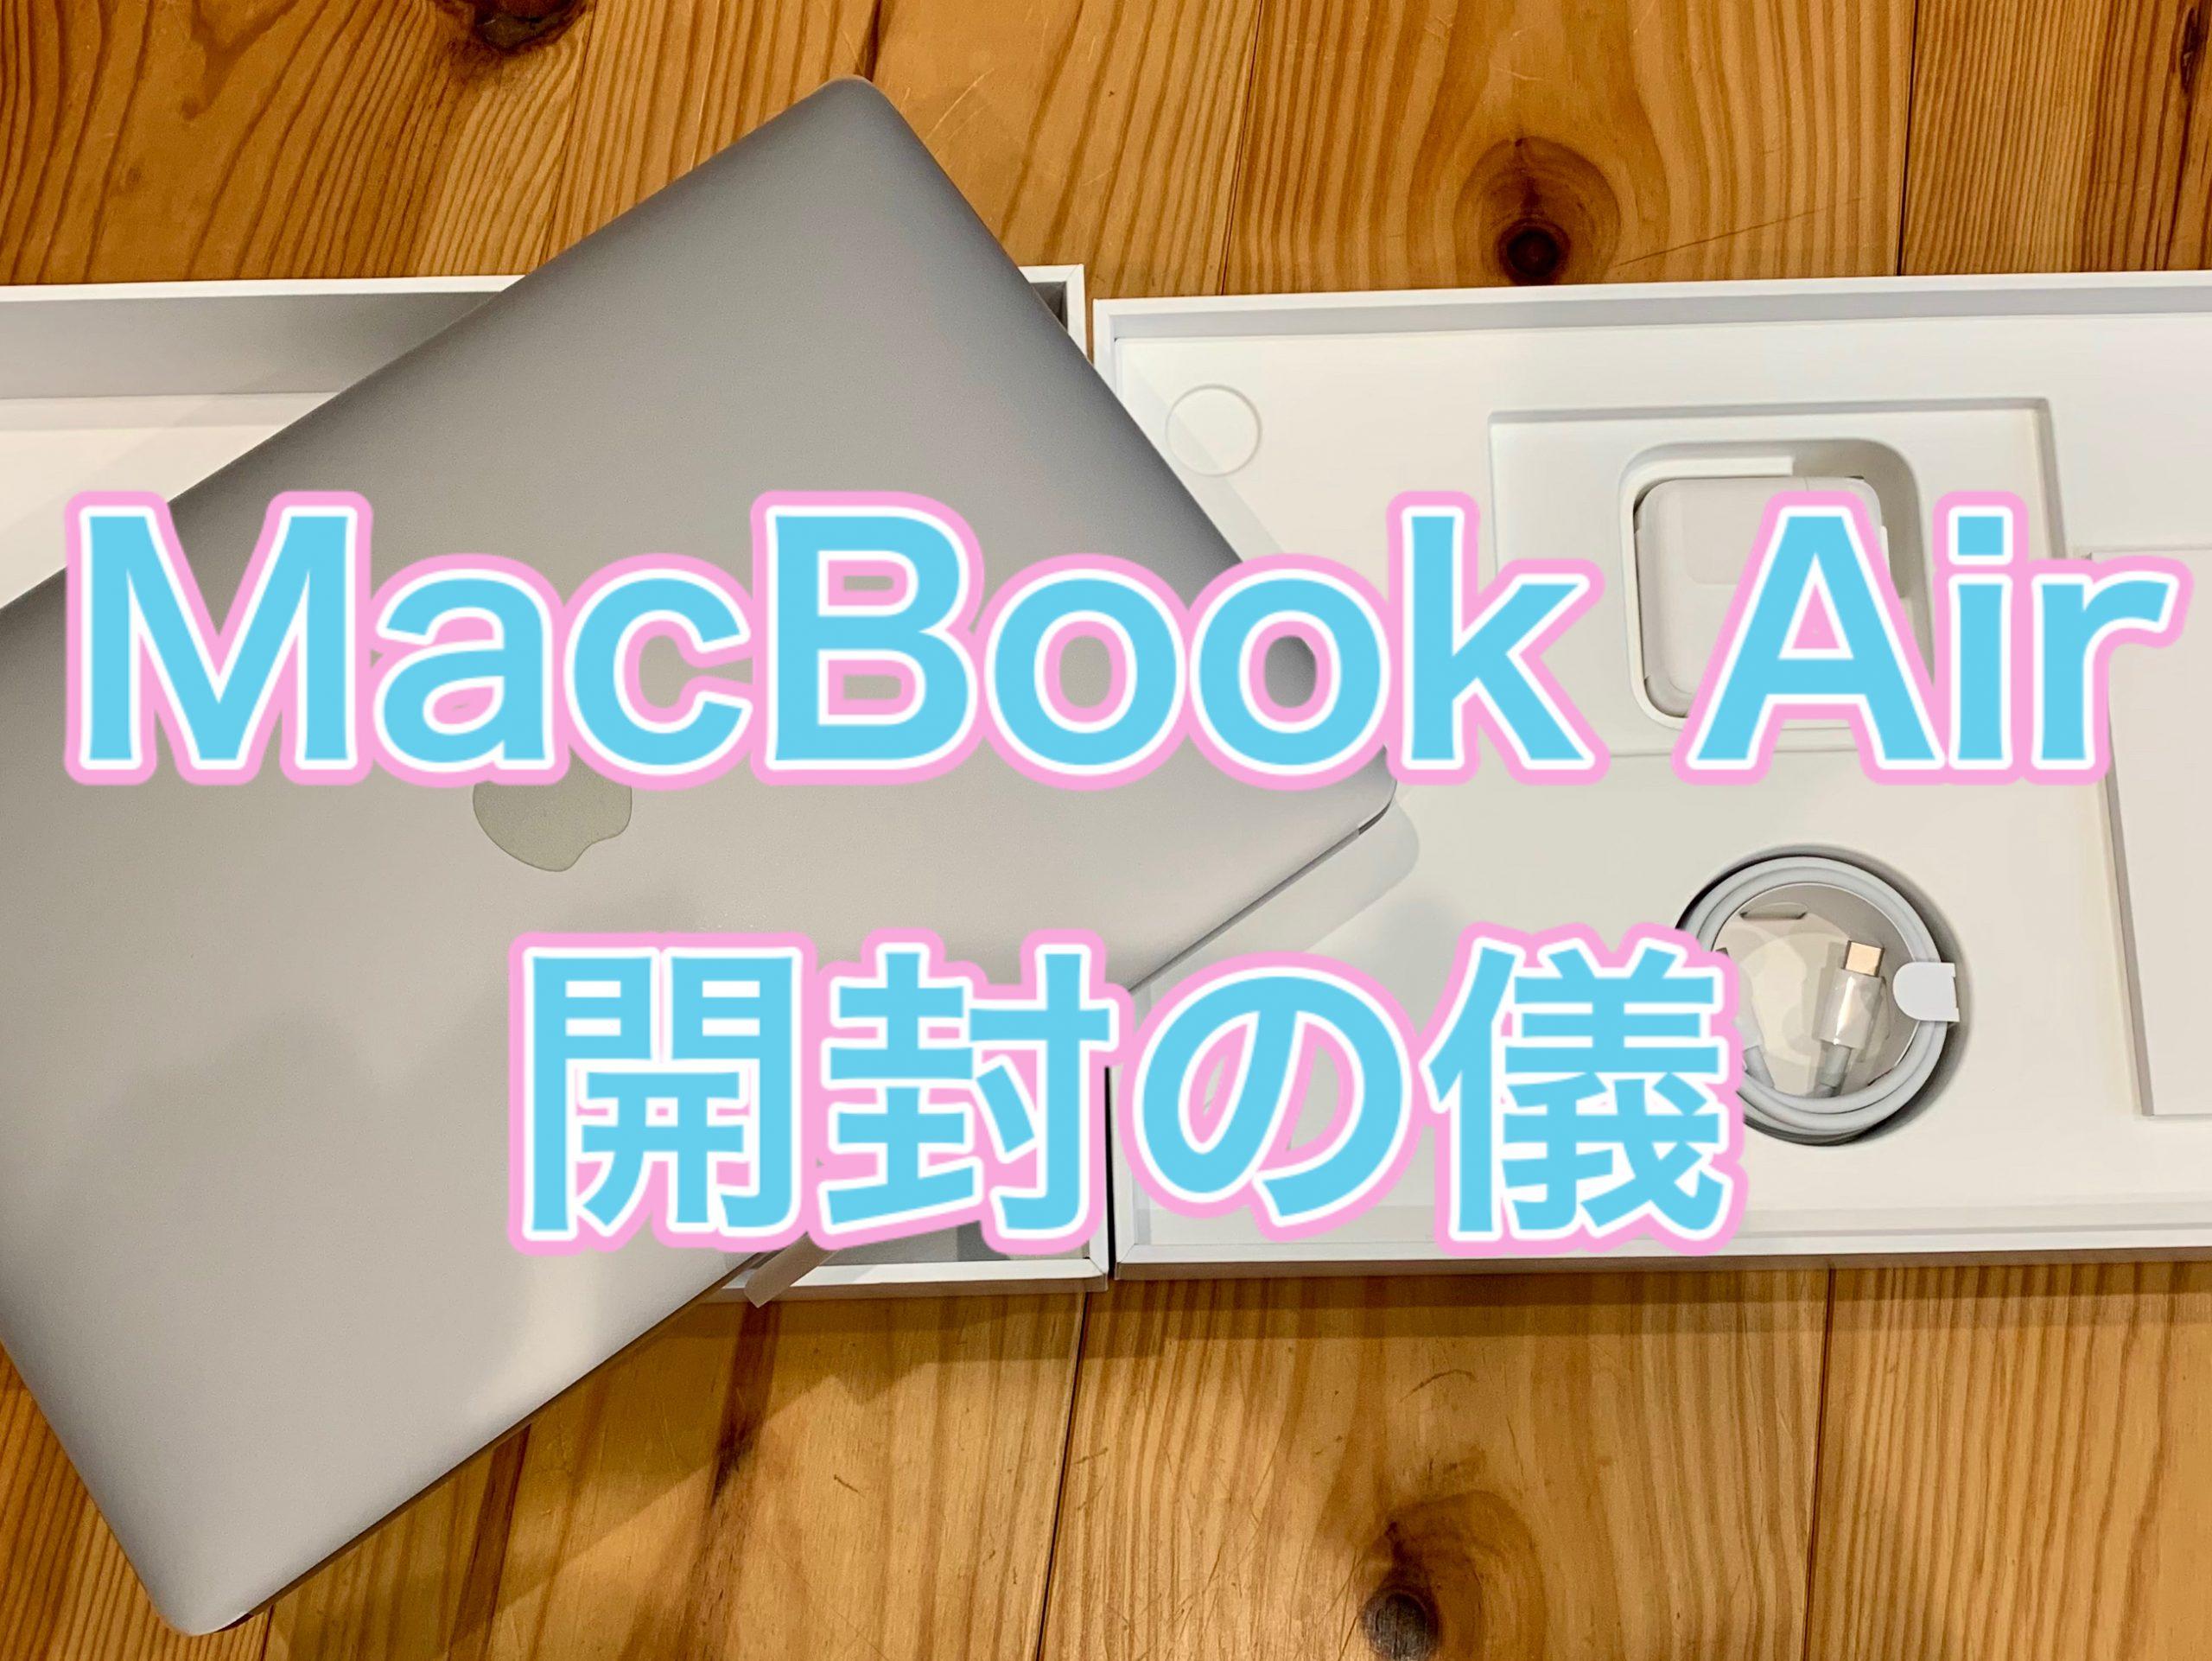 MacBook Air M1整備済品 - 開封の儀 - イメージ画像